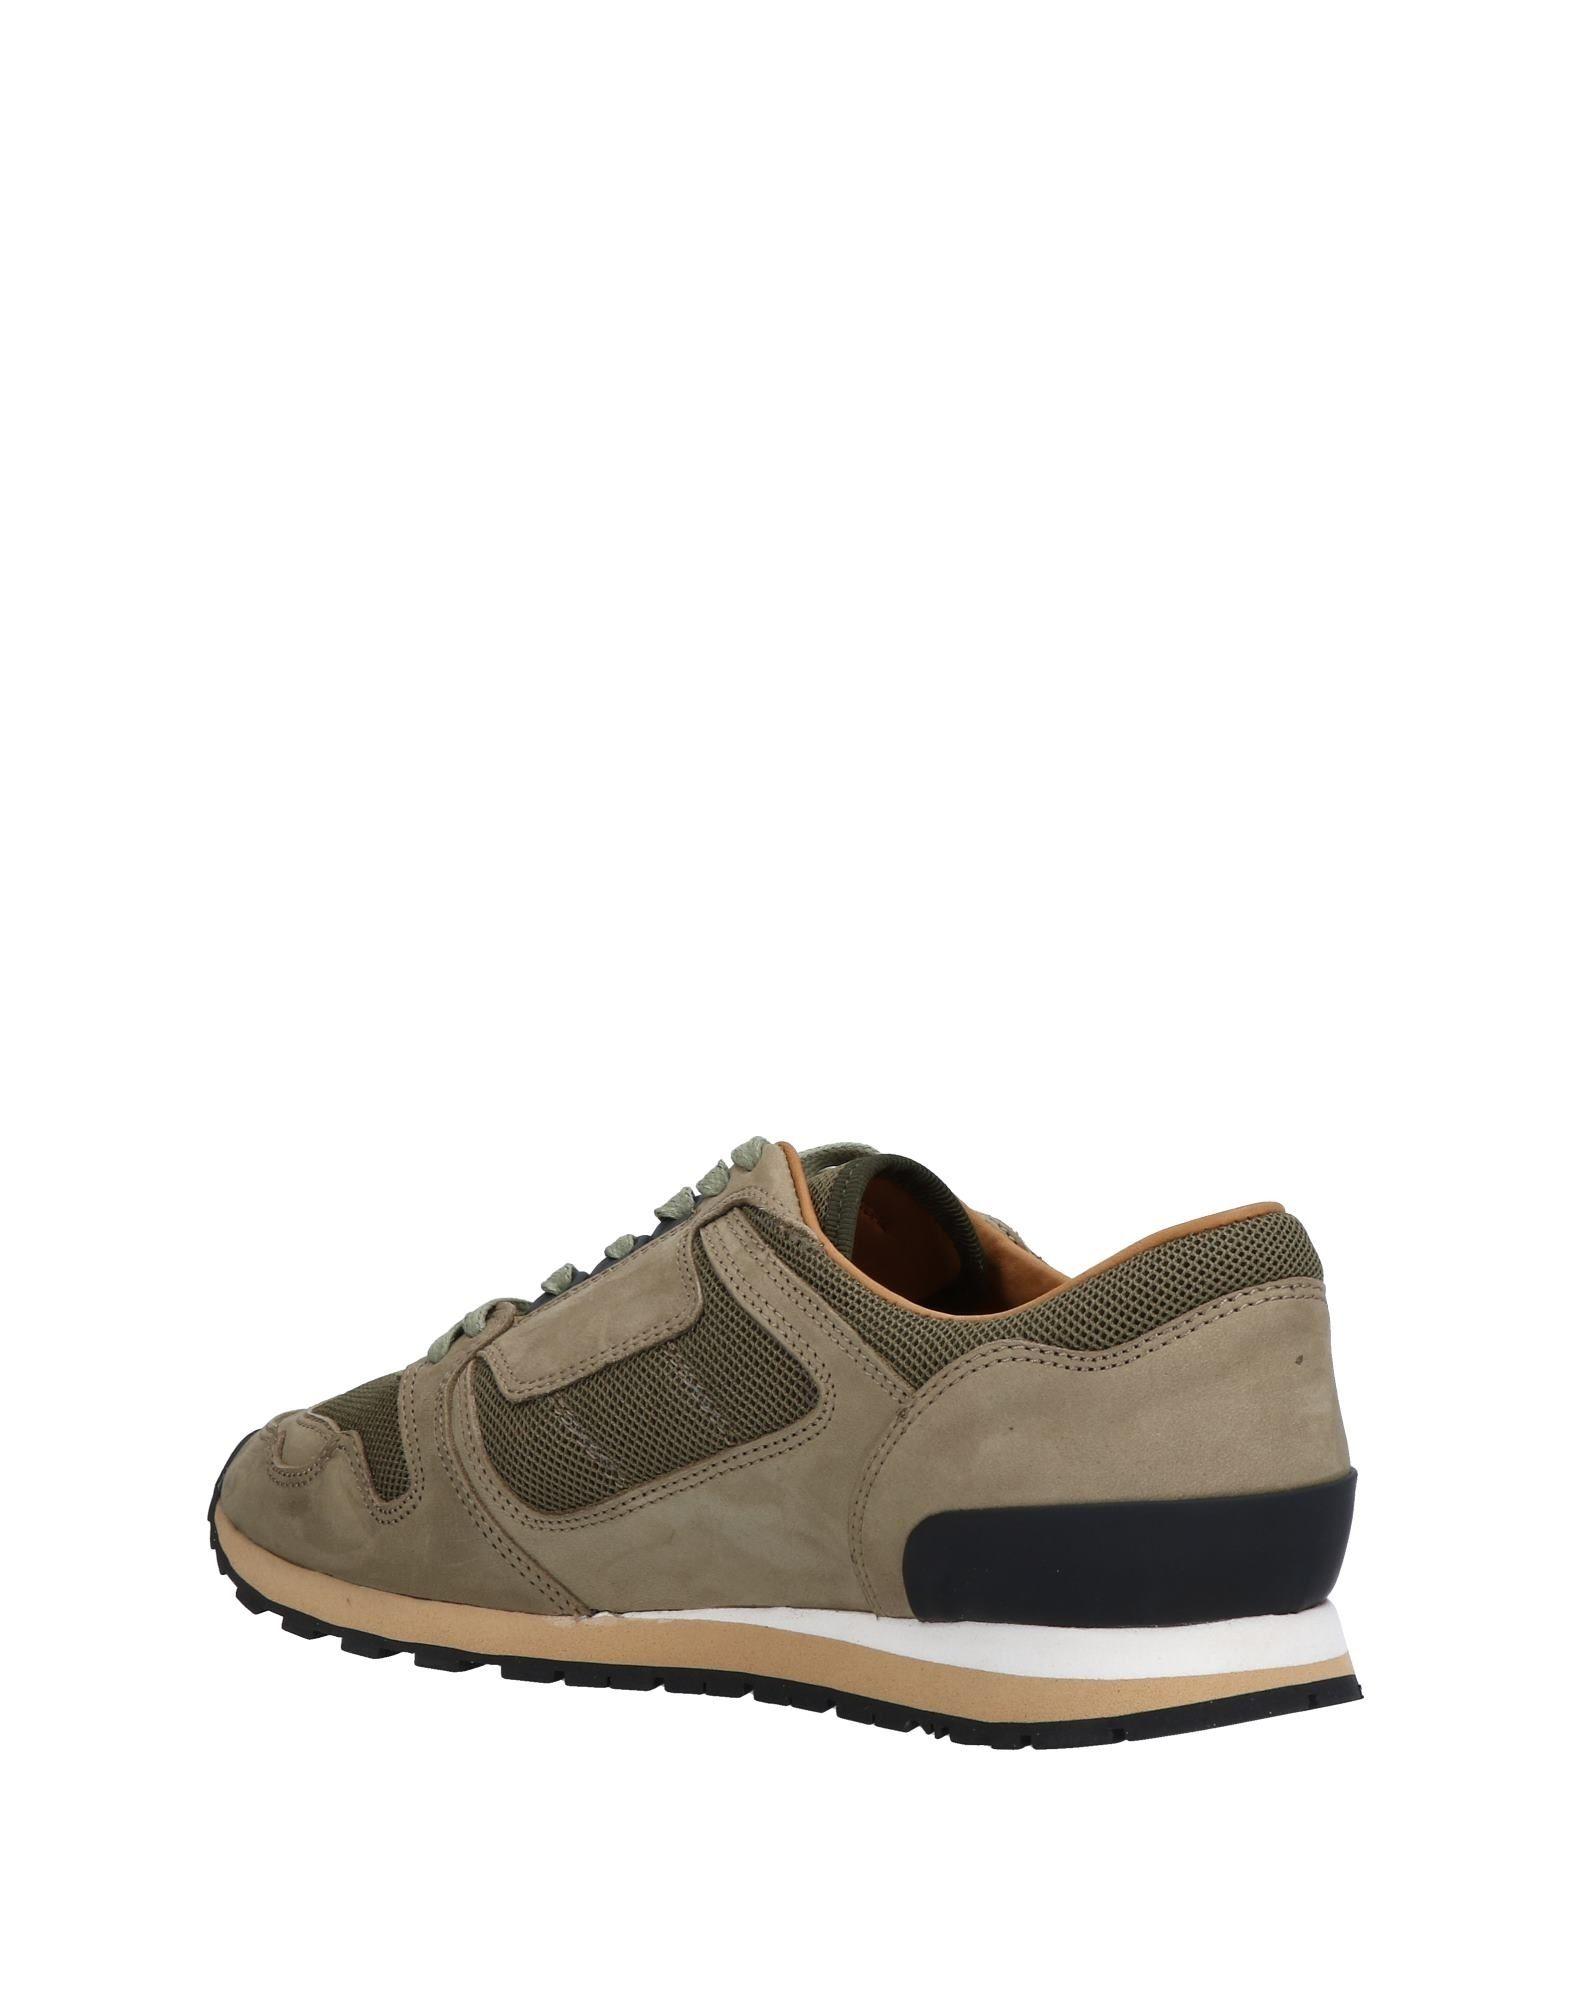 N.D.C. Made By Hand Sneakers Herren  11515832XL